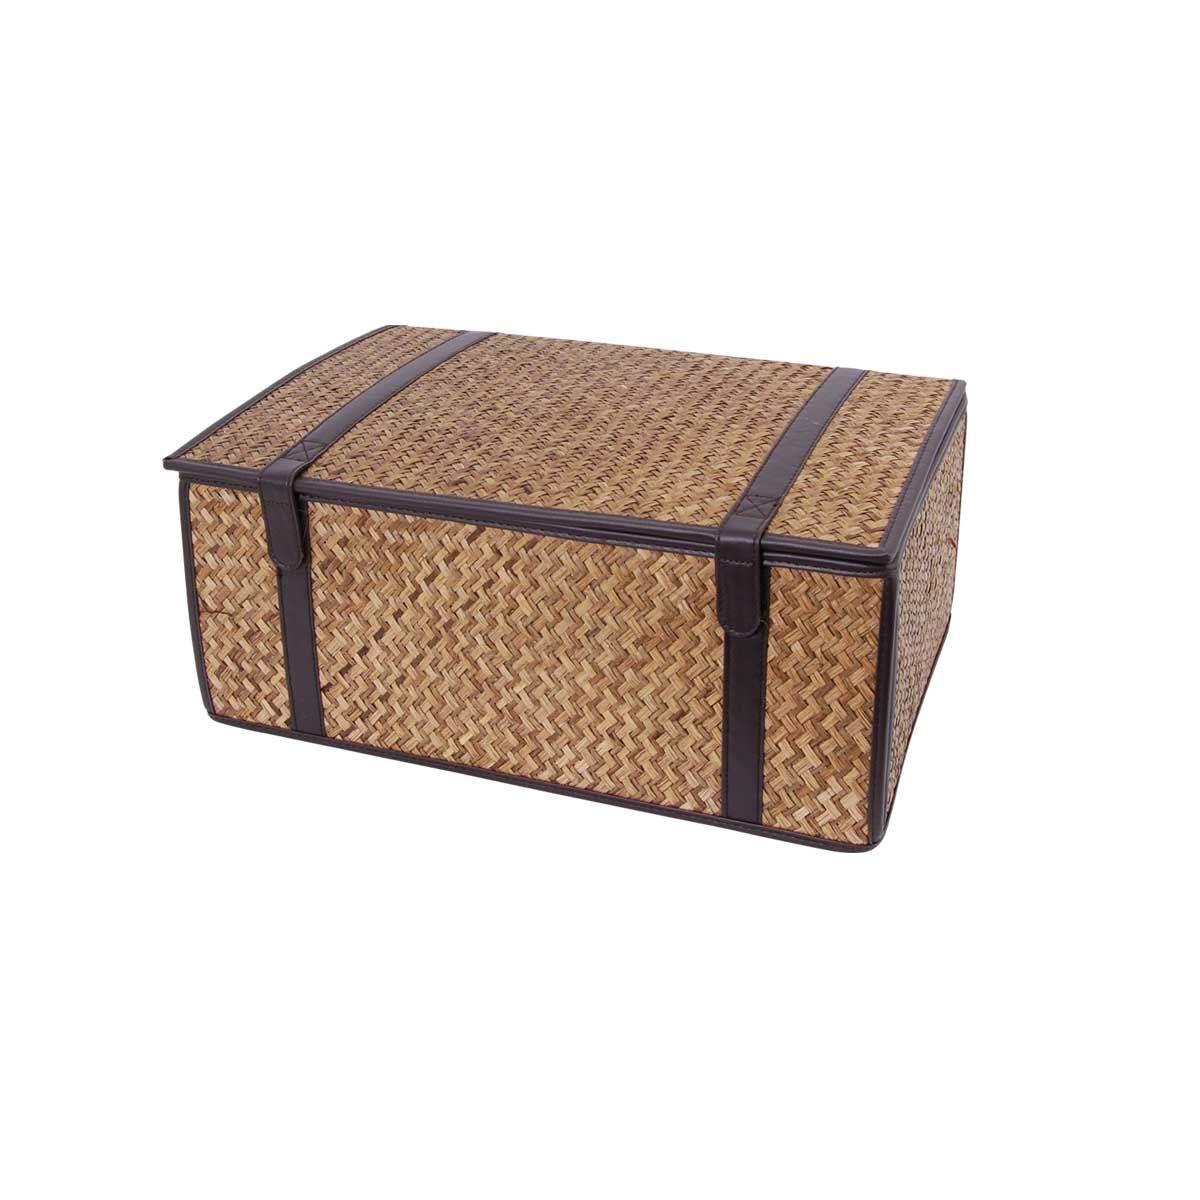 10 x WBC Folding Matt Grass & Faux Leather Hamper Baskets FMG15 Fold for Storage